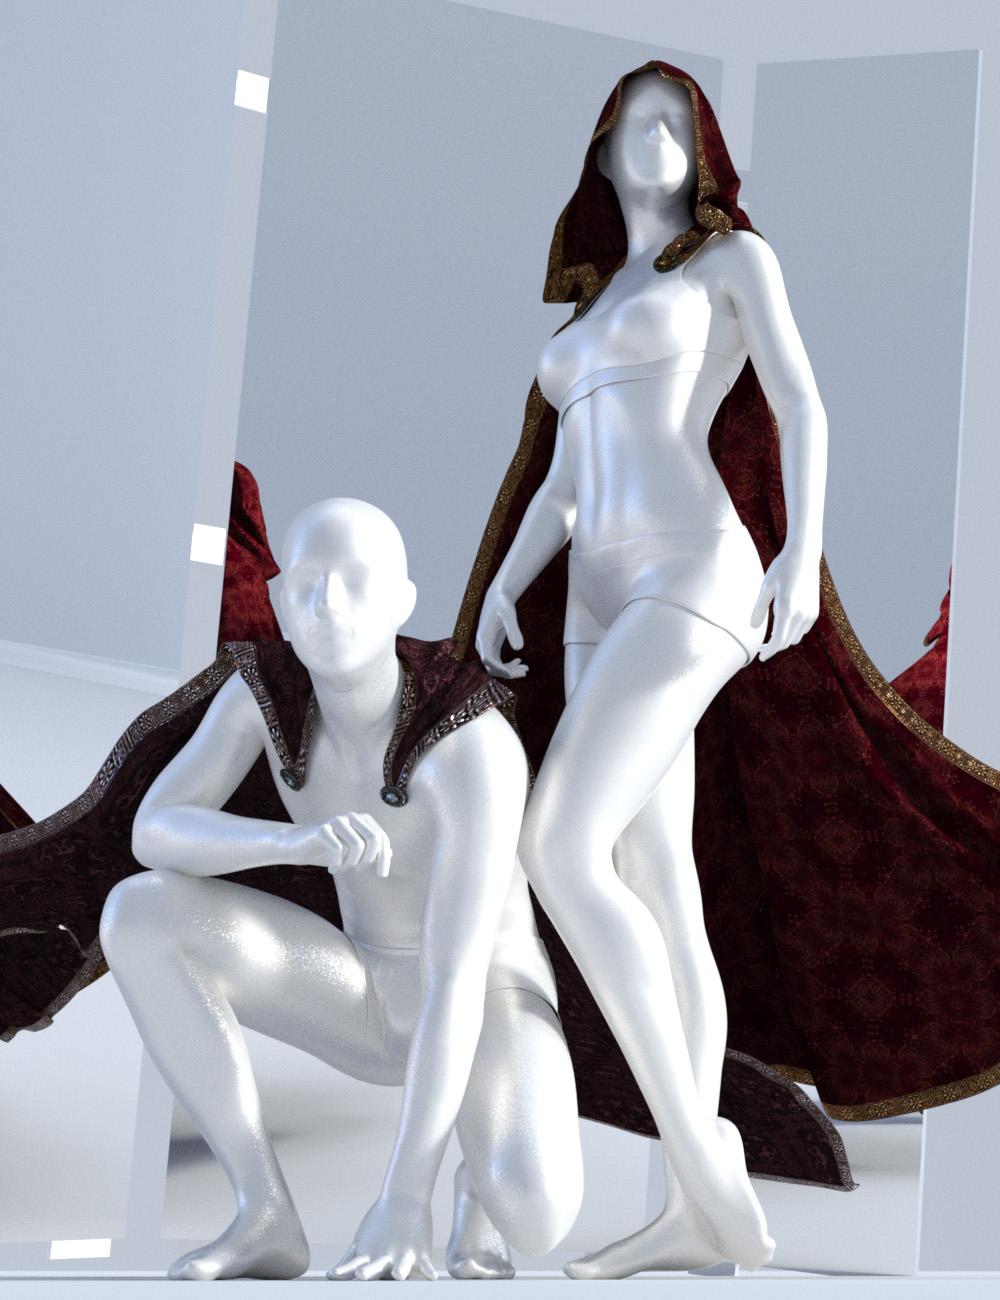 dForce SsC Knight Cloak for Genesis 3 and 8 by: Sshodan, 3D Models by Daz 3D